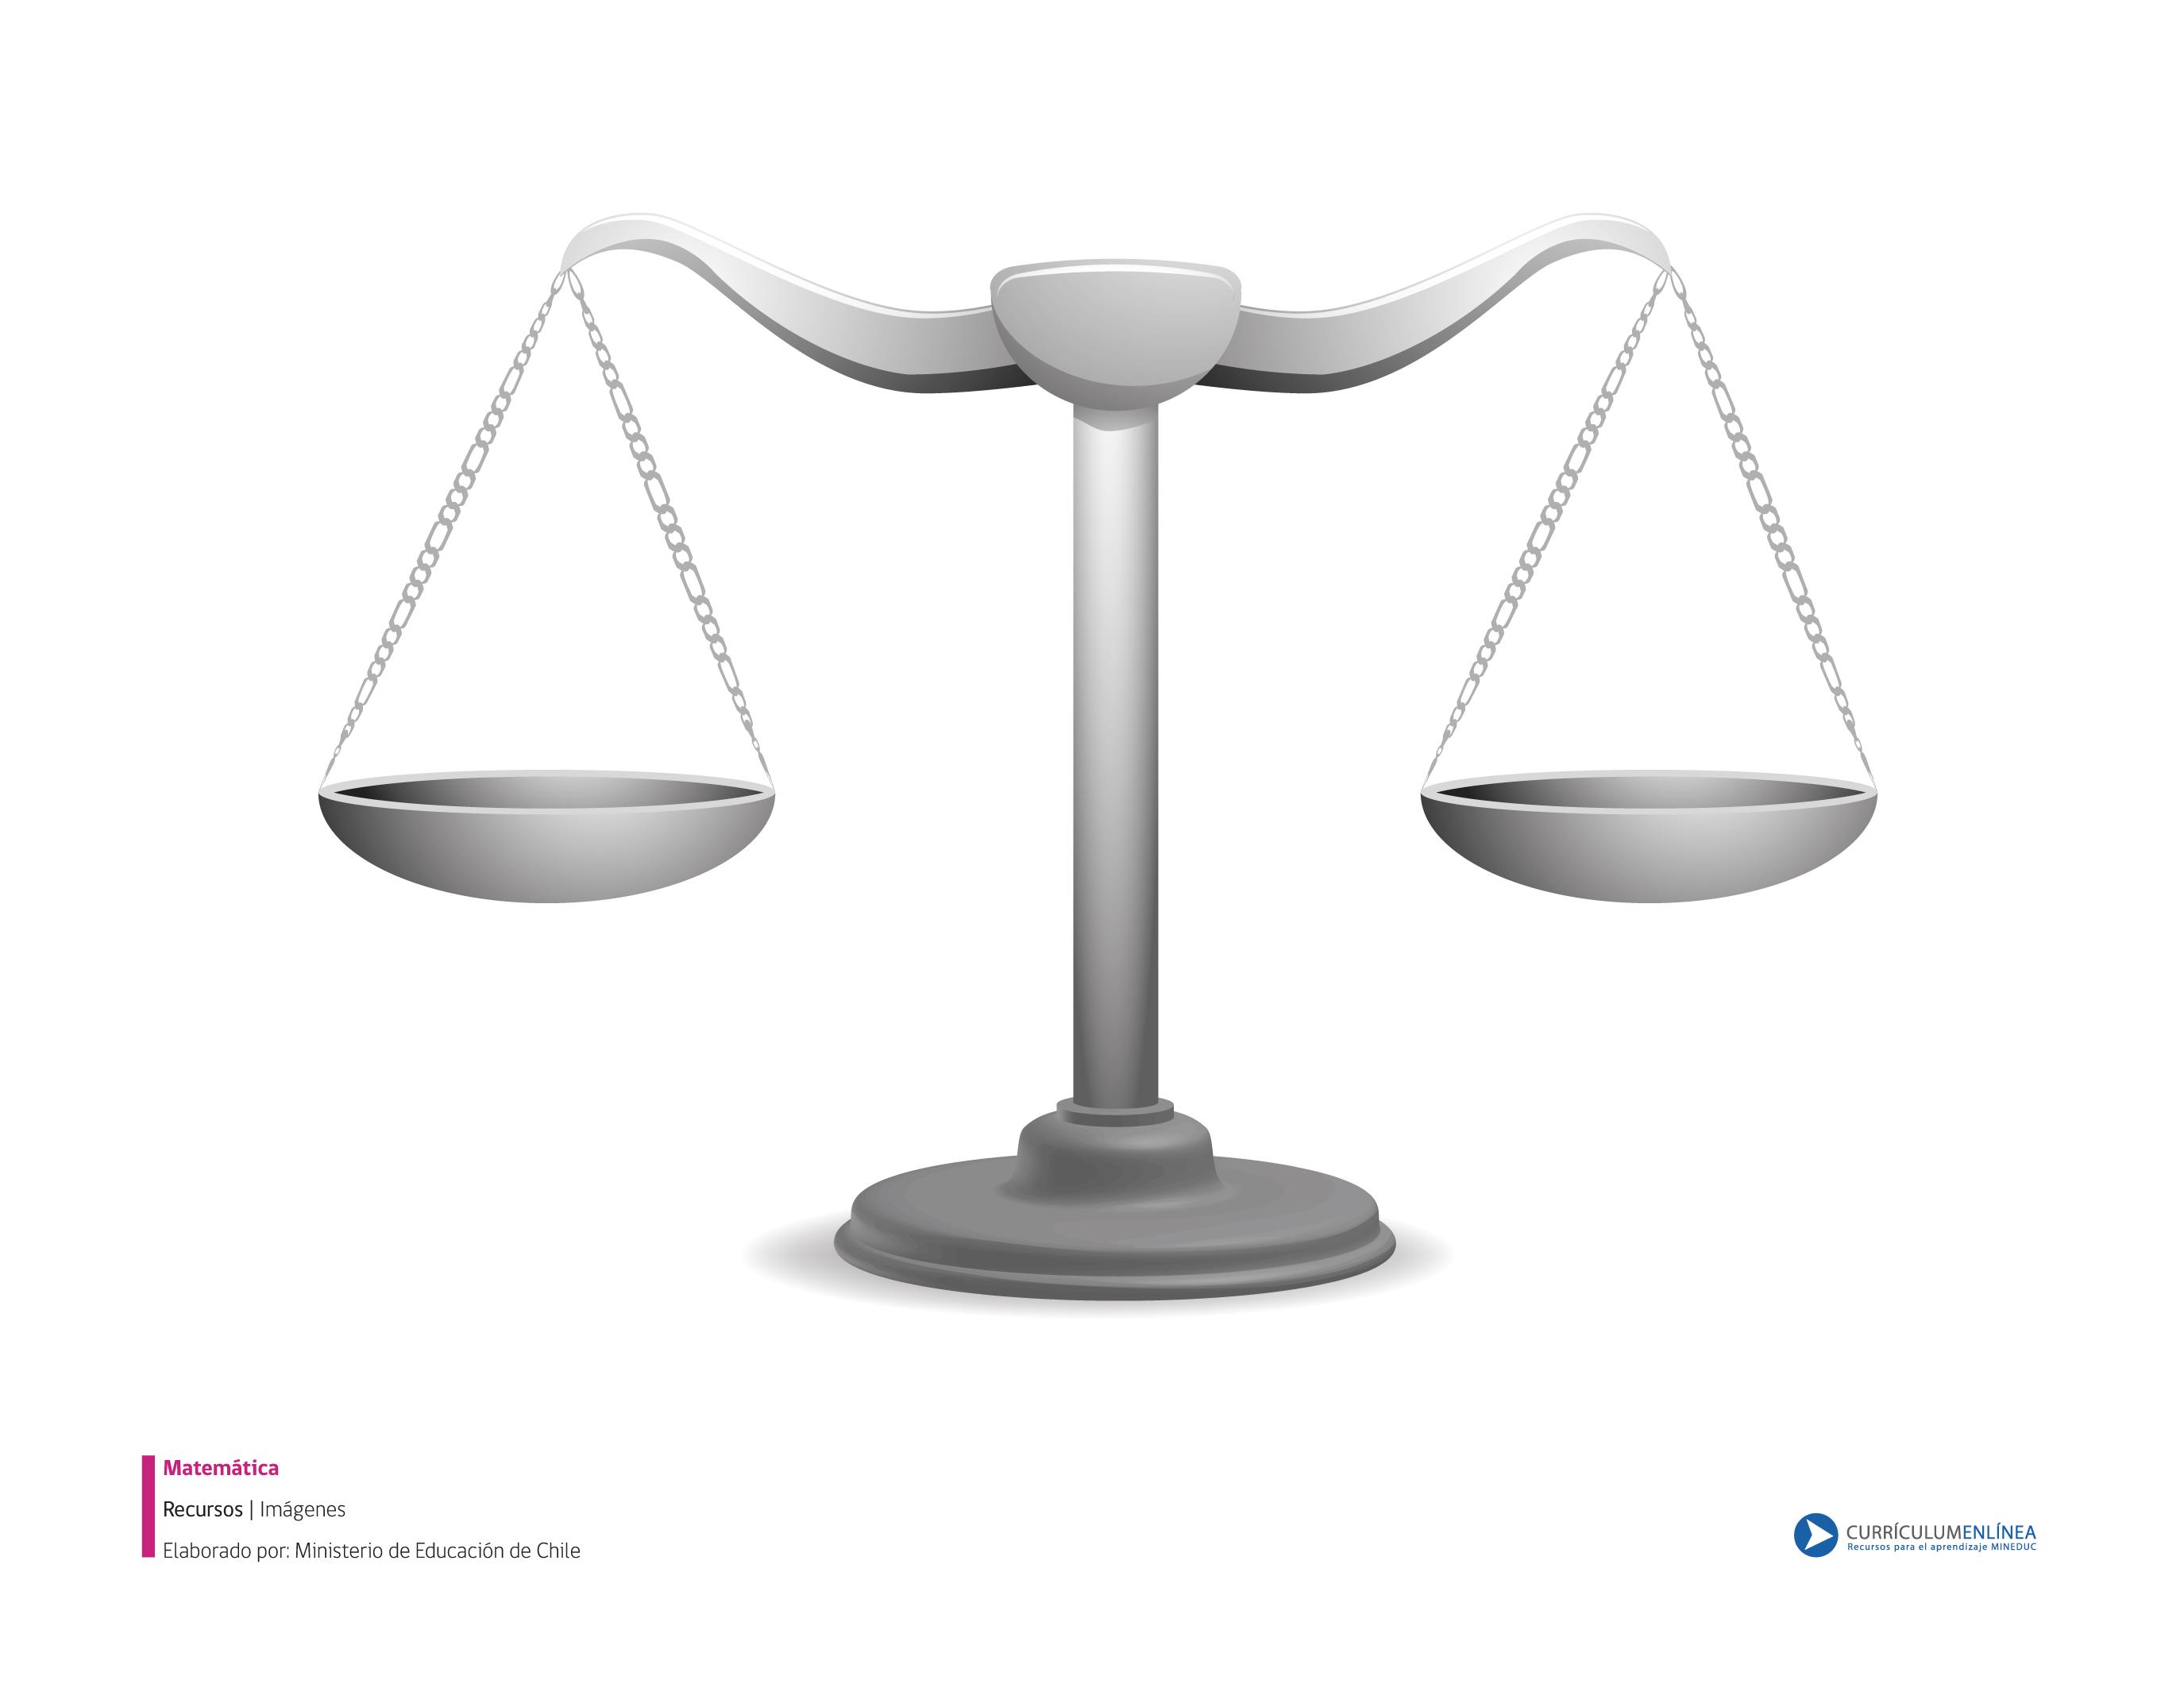 Worksheet. Balanza  Currculum en lnea MINEDUC Gobierno de Chile